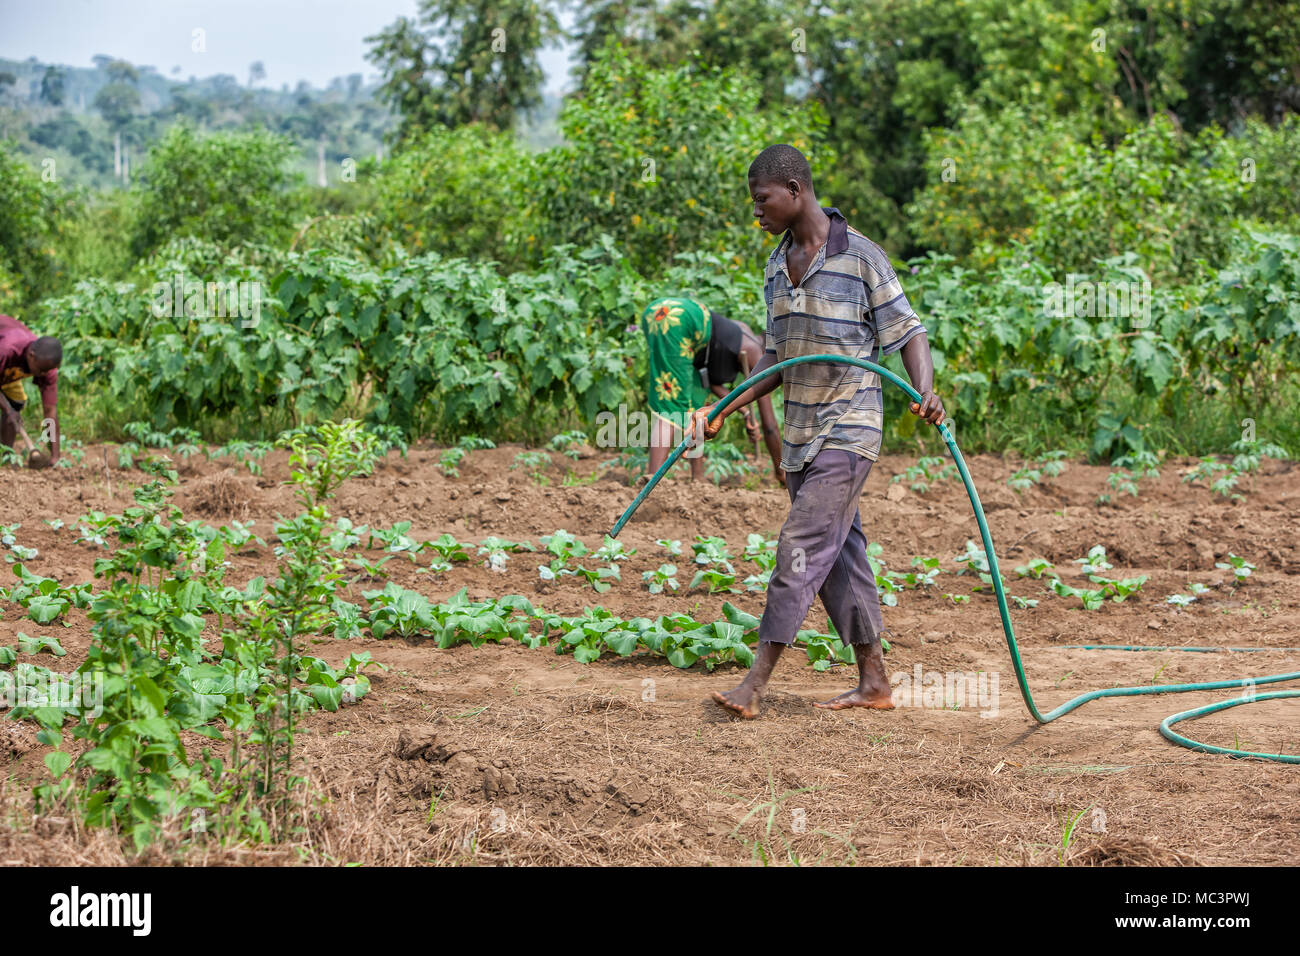 CABINDA/ANGOLA - 09 JUN 2010 - African rural farmer to watering plantation. - Stock Image